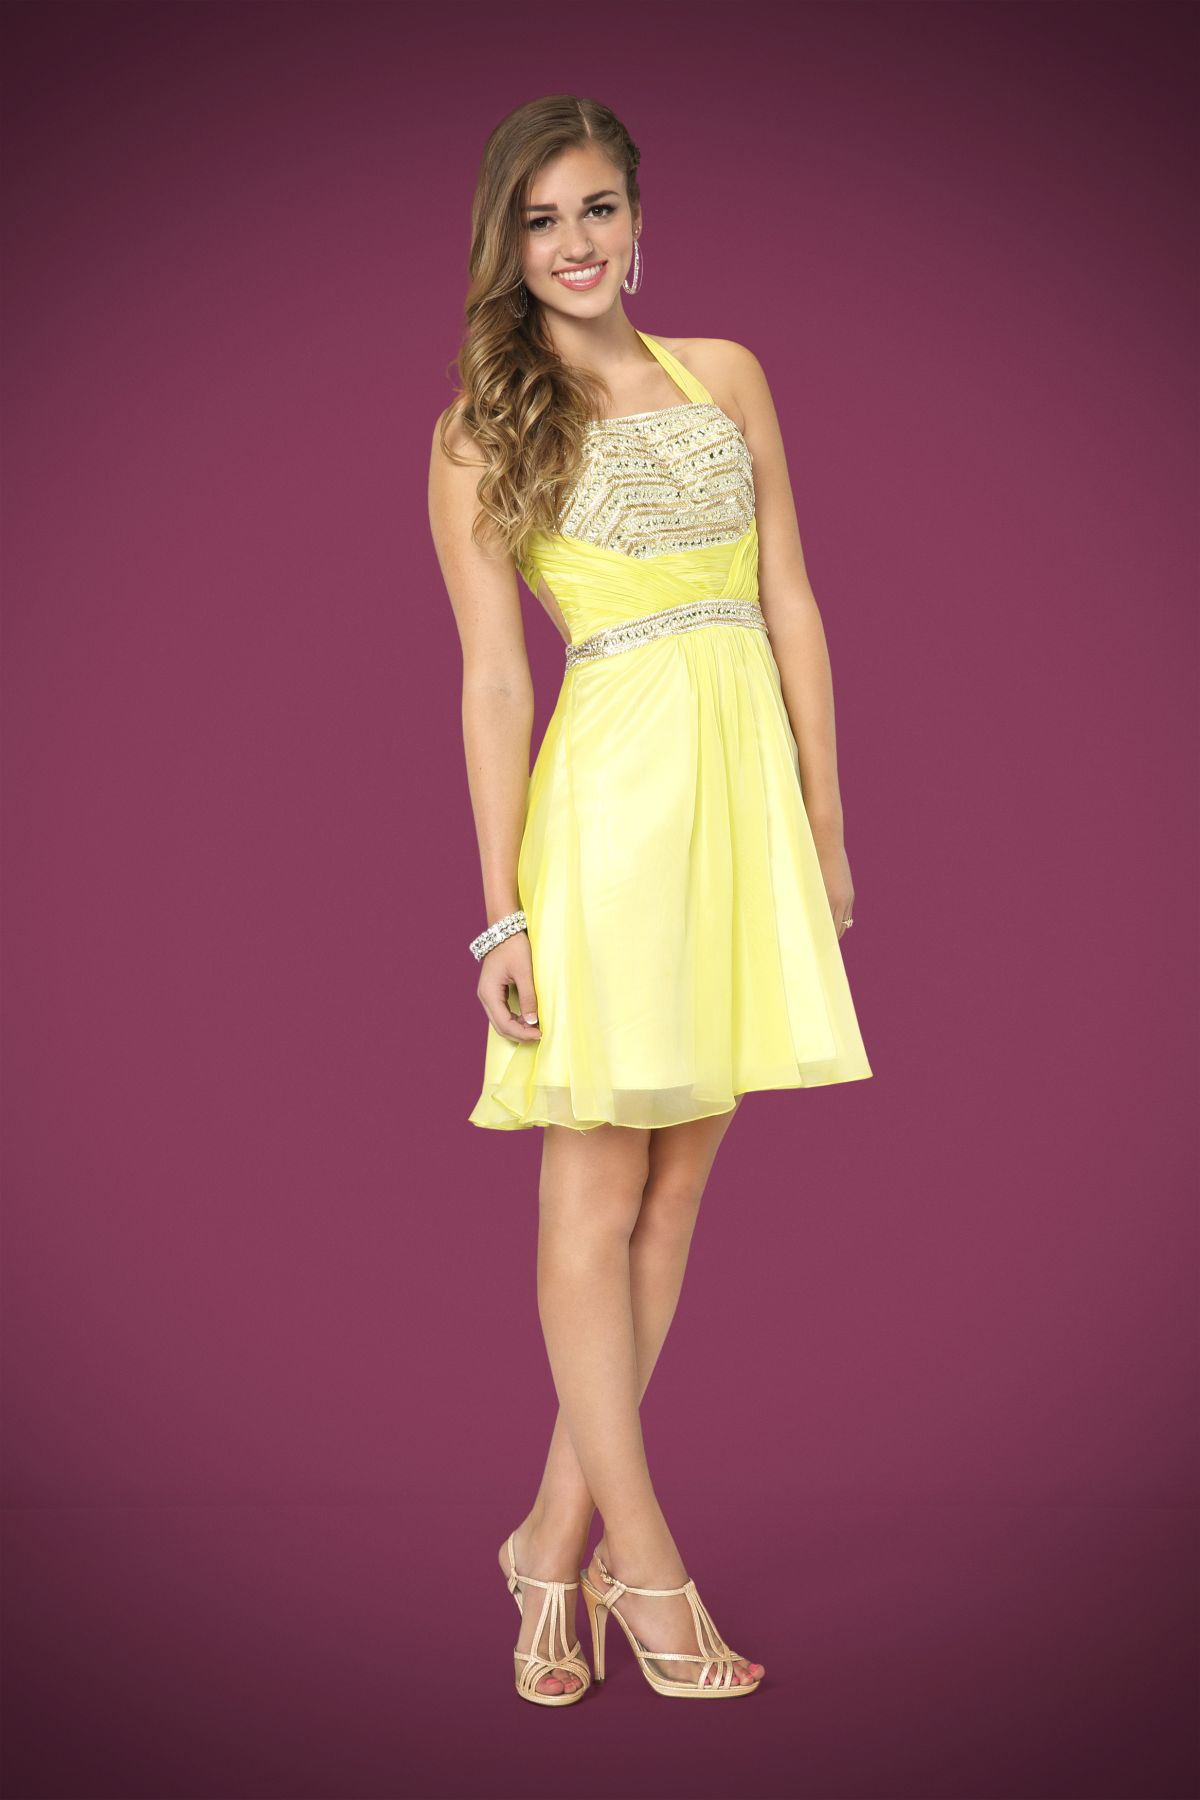 SADIE ROBERTOSN - Dancing With the Stars, Season 19 Promos